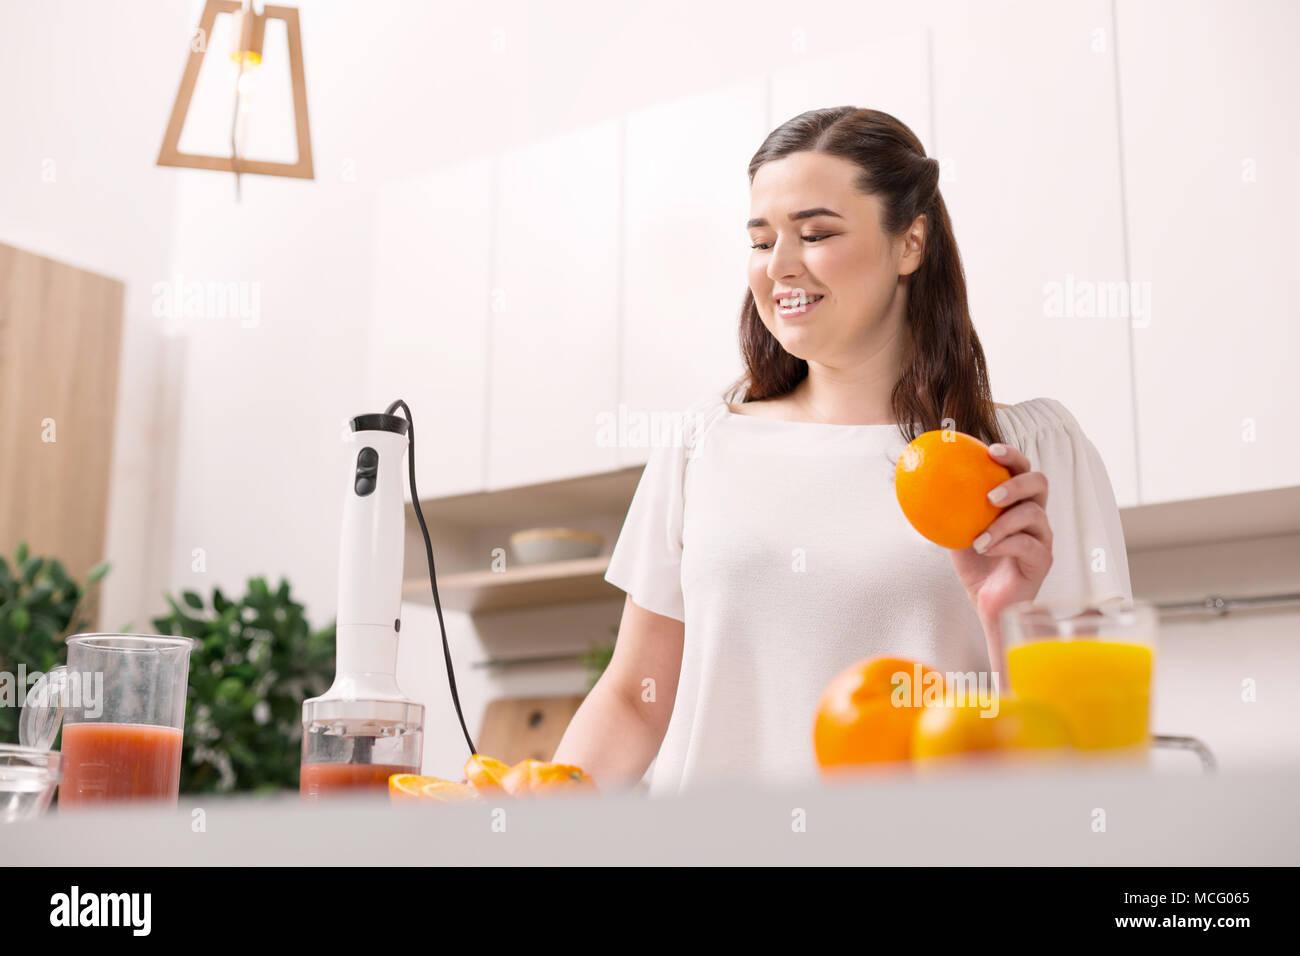 Glad jolly woman squeezing orange fresh - Stock Image